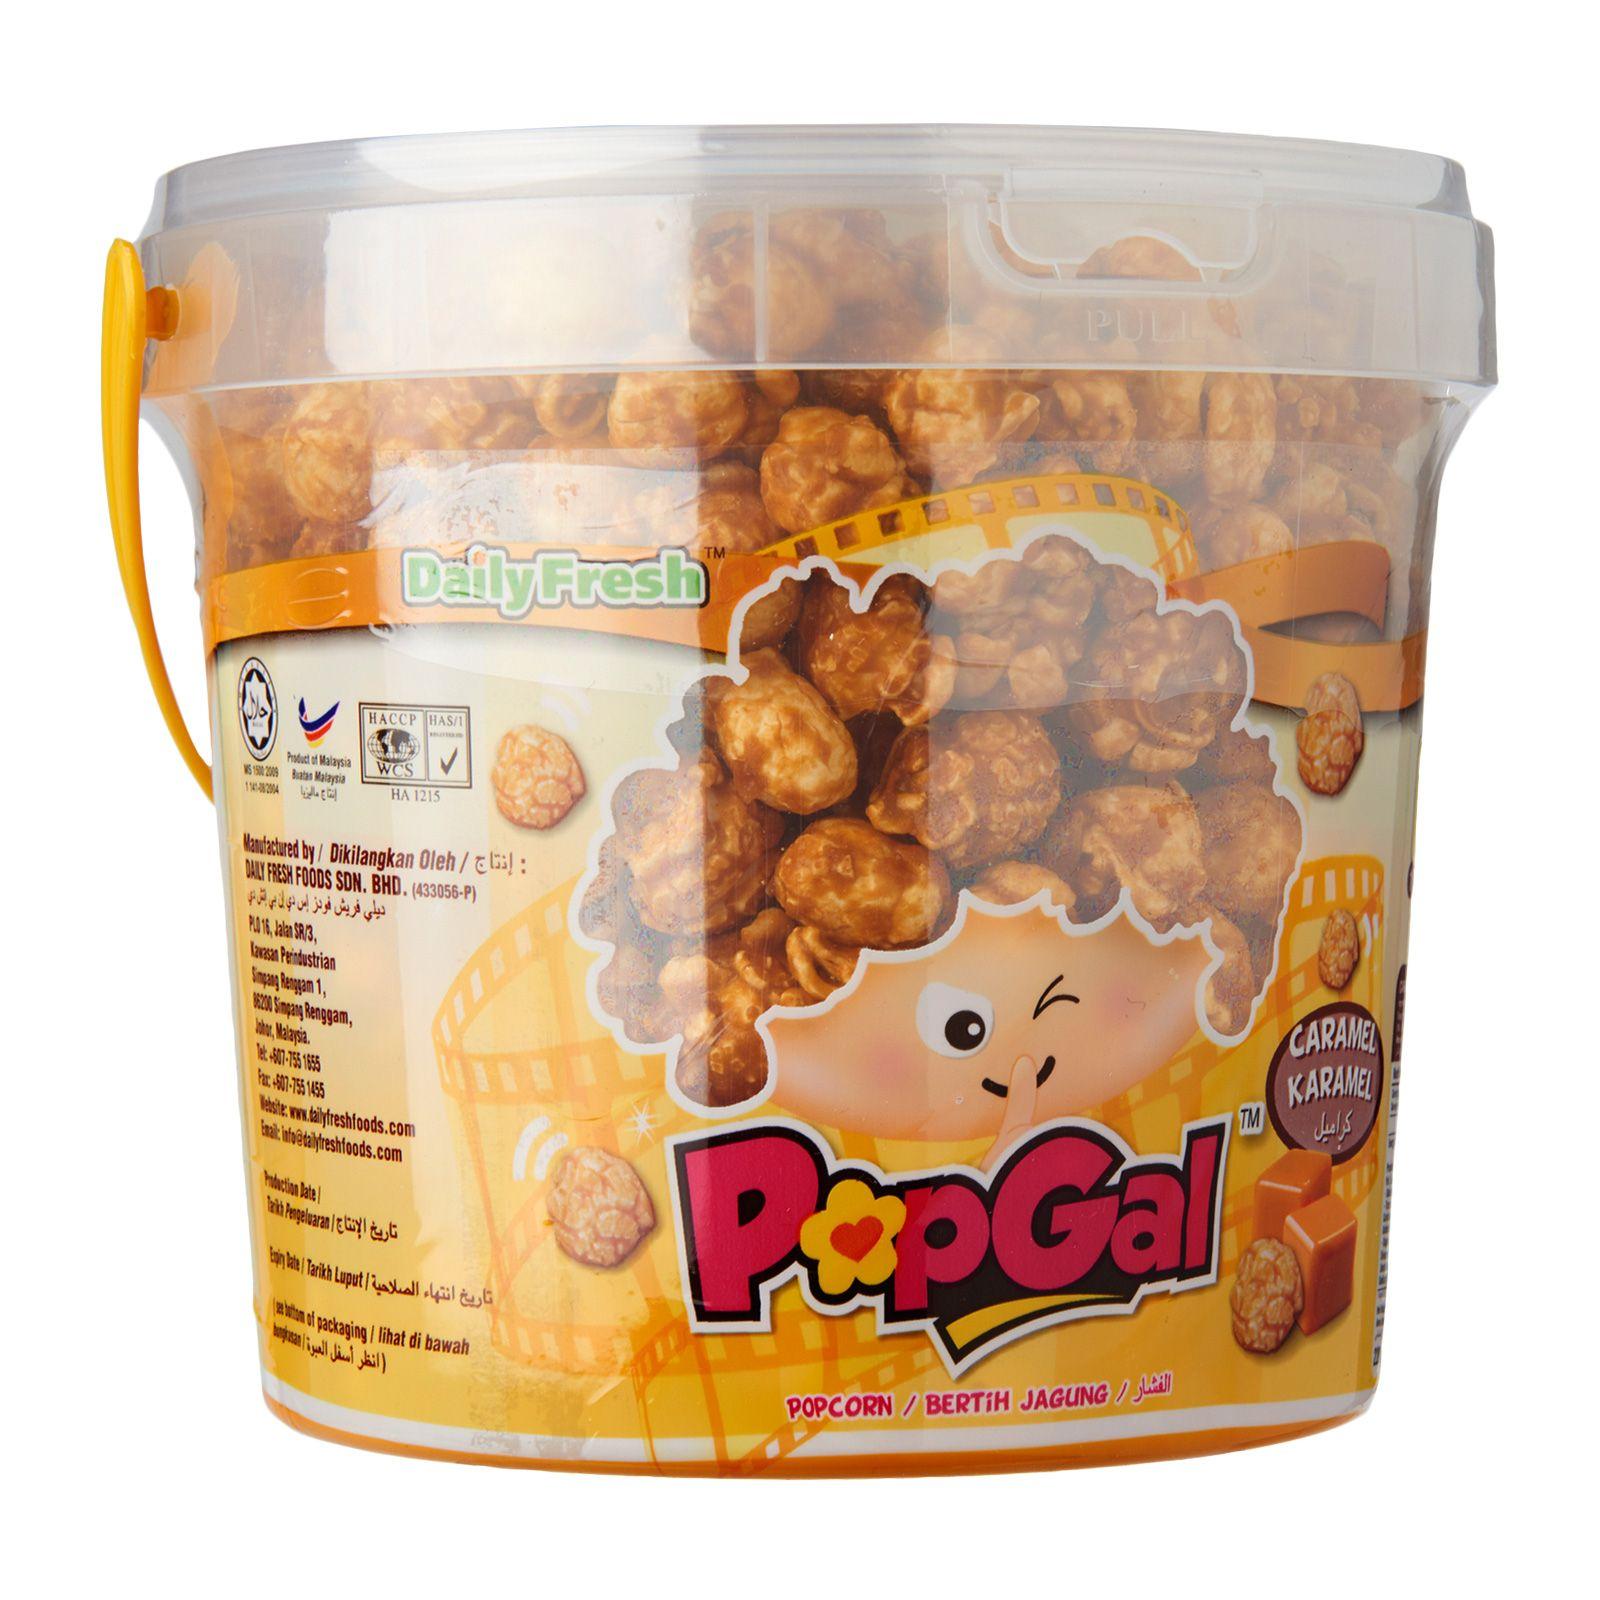 Popgal Caramel Flavored Popcorn Redmart Flavored Popcorn